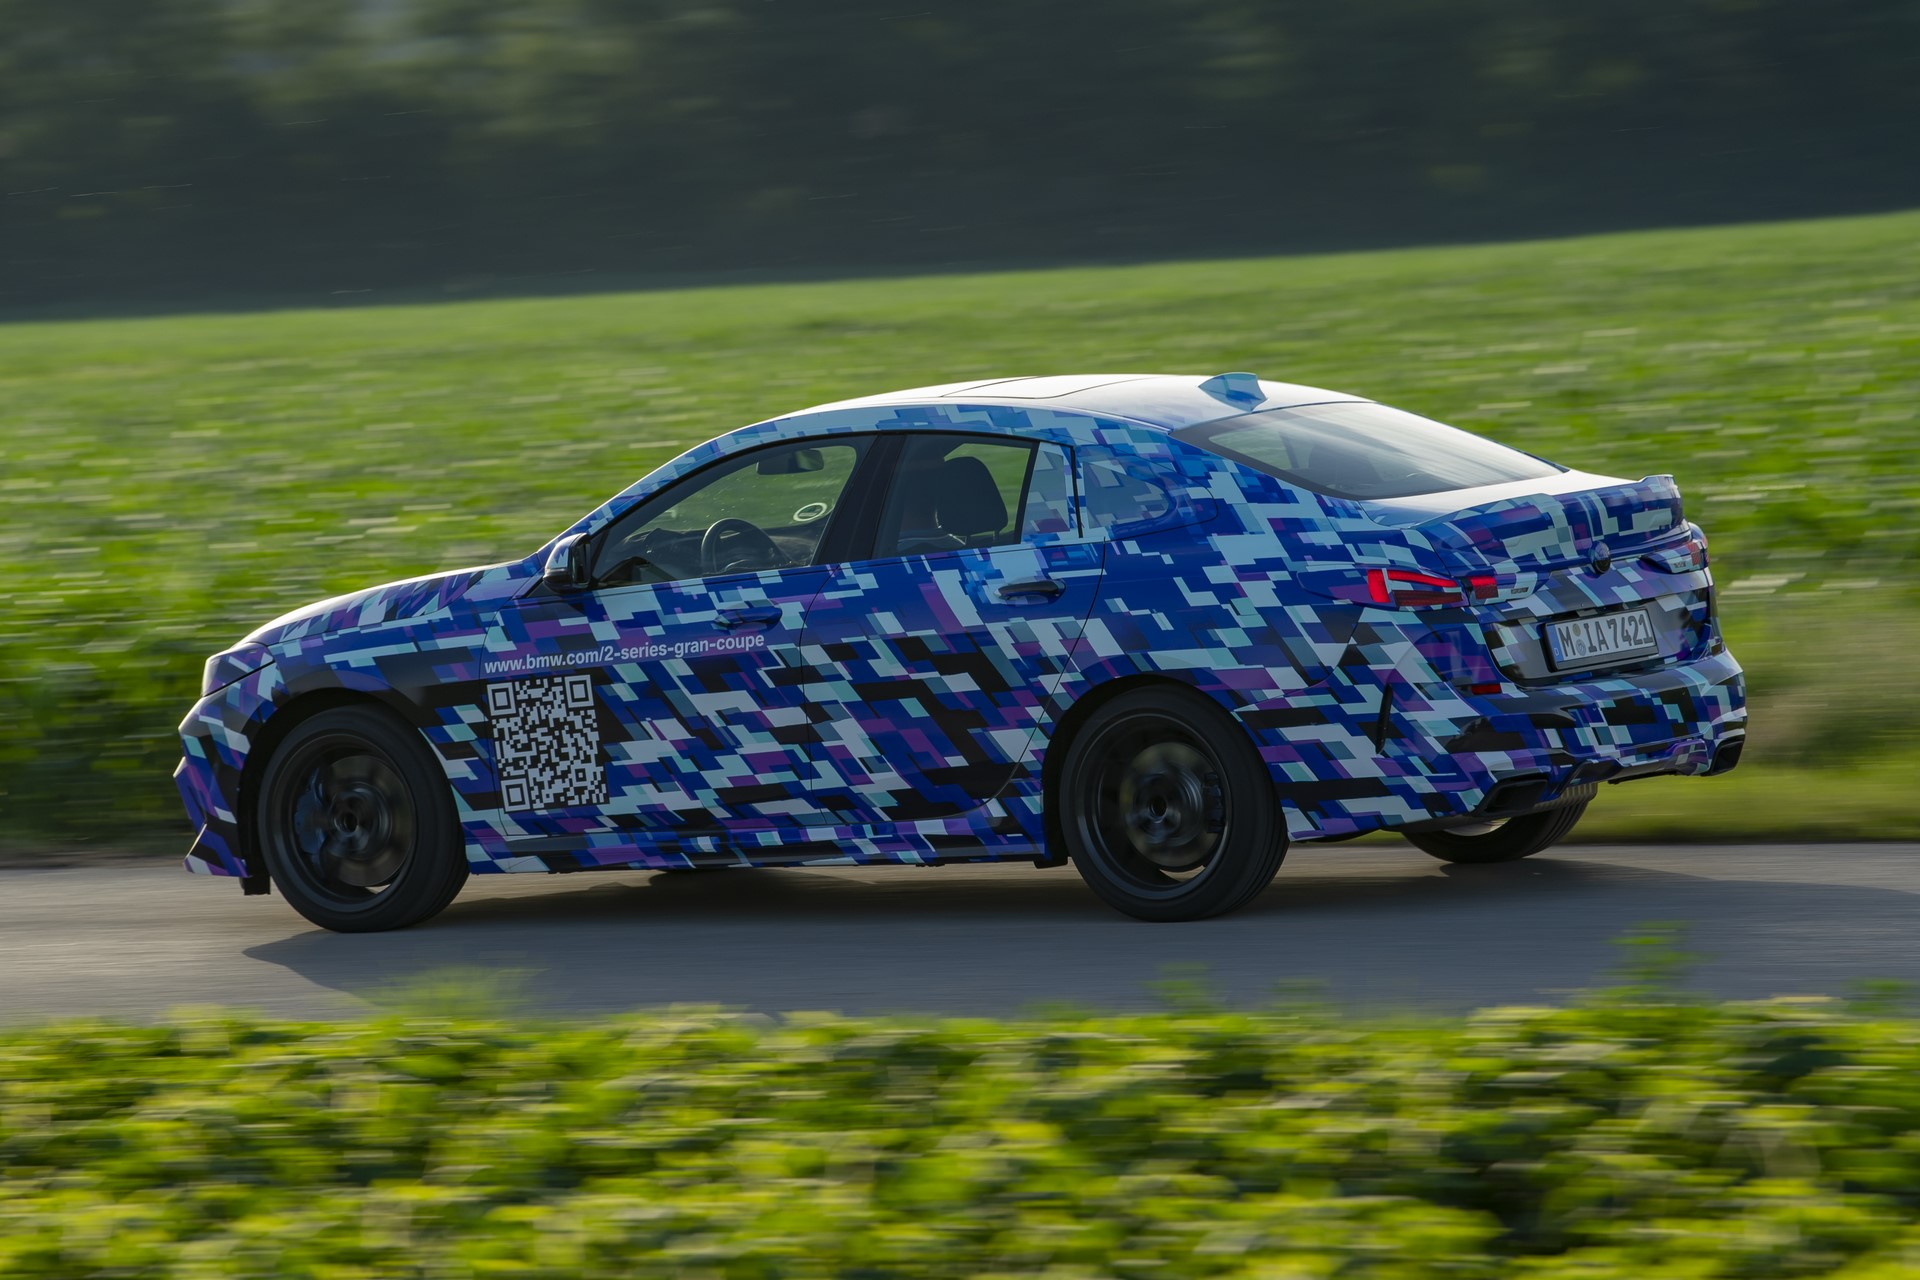 BMW-2-Series-Gran-Coupe-2020-spy-photos-13